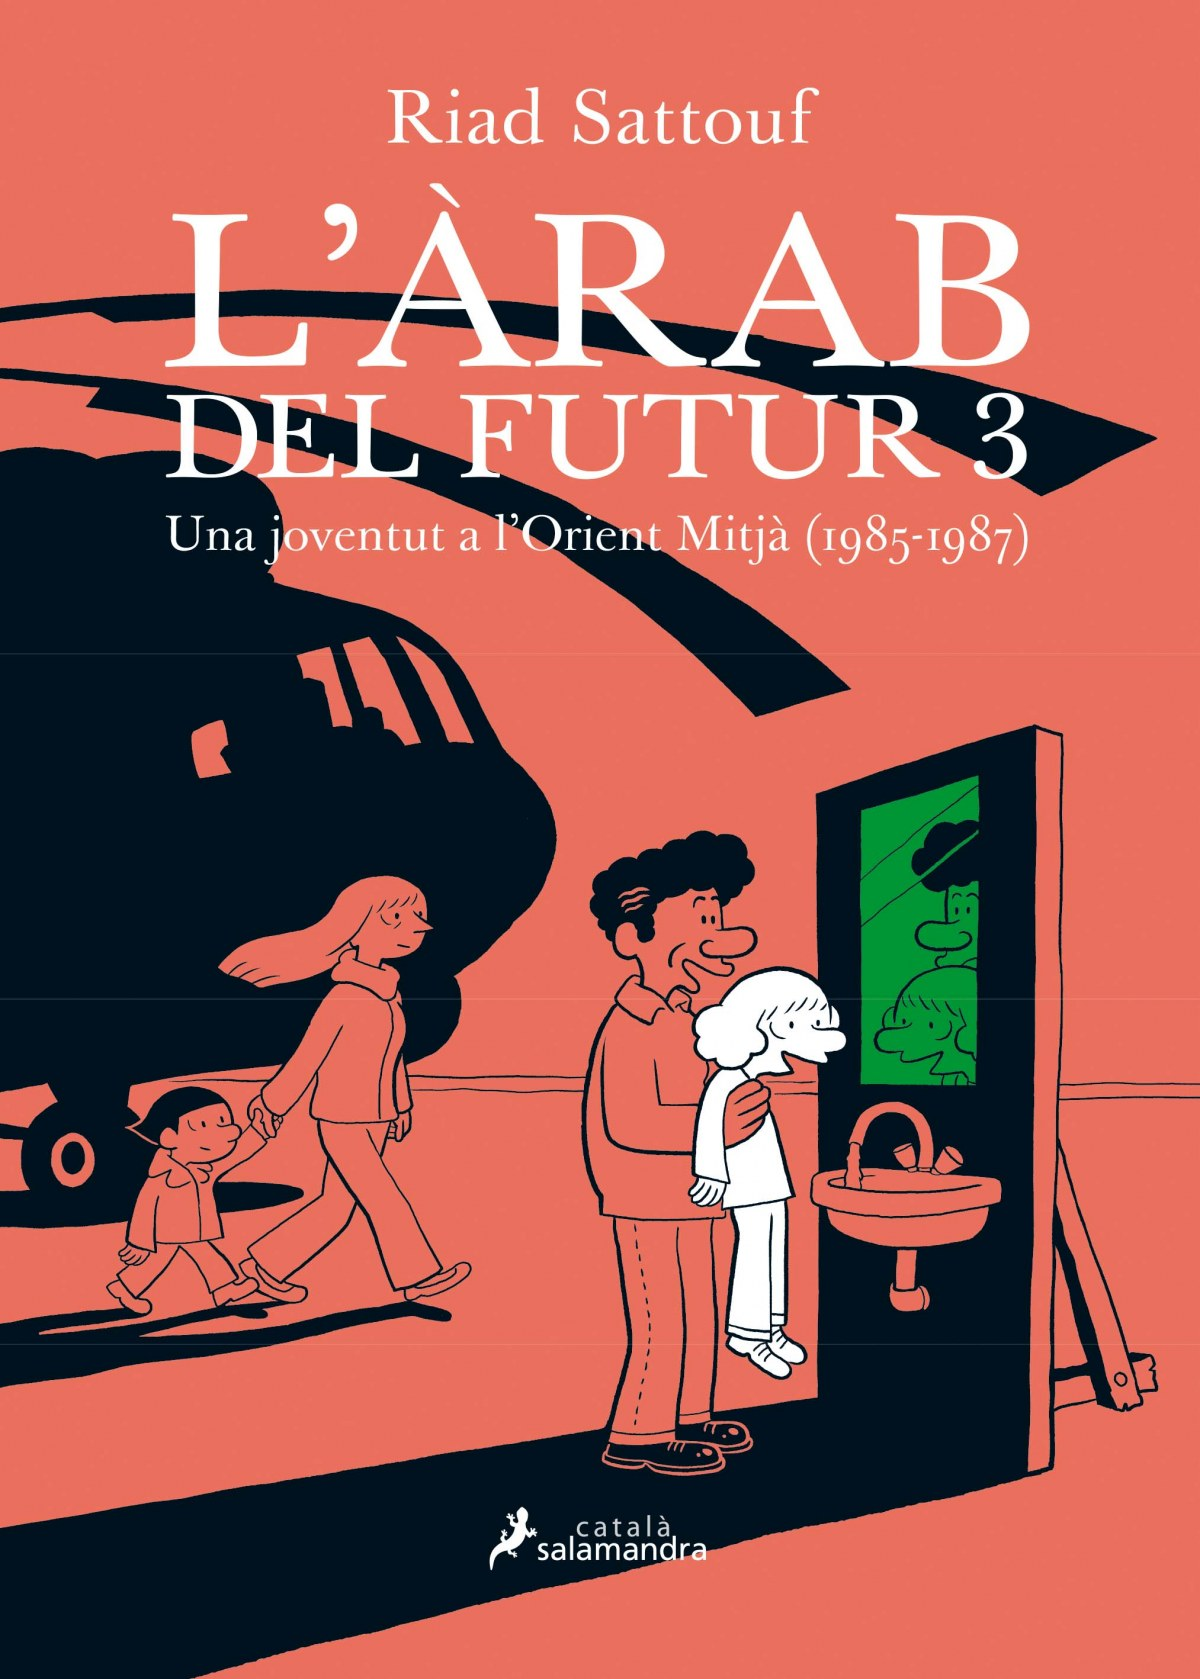 L'ARAB DEL FUTUR III